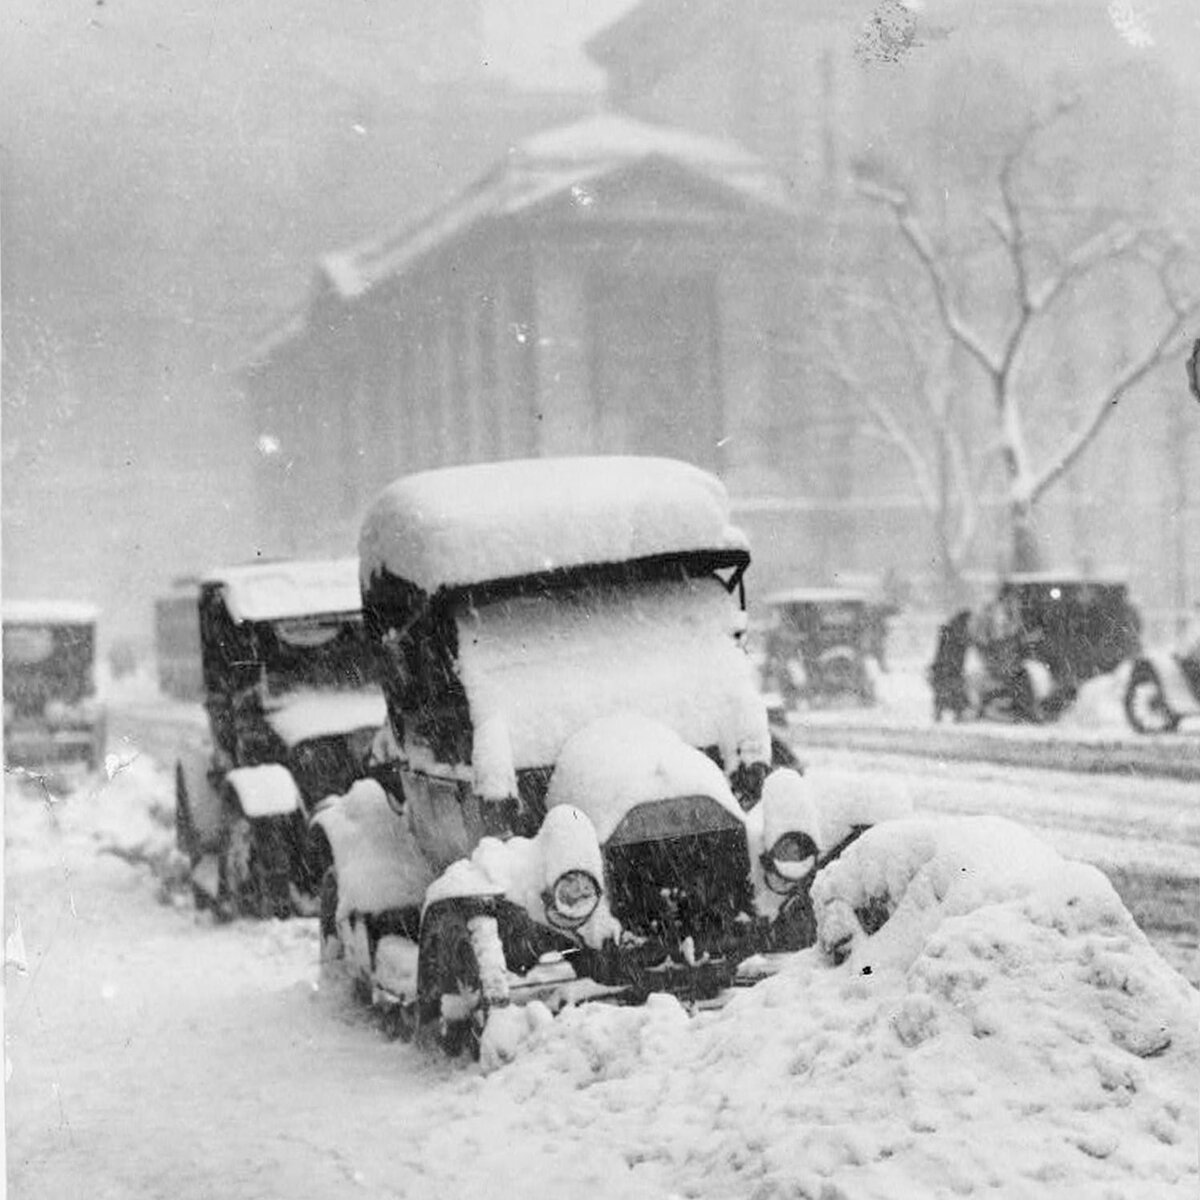 Фото: сайт Библиотеки Конгресса США